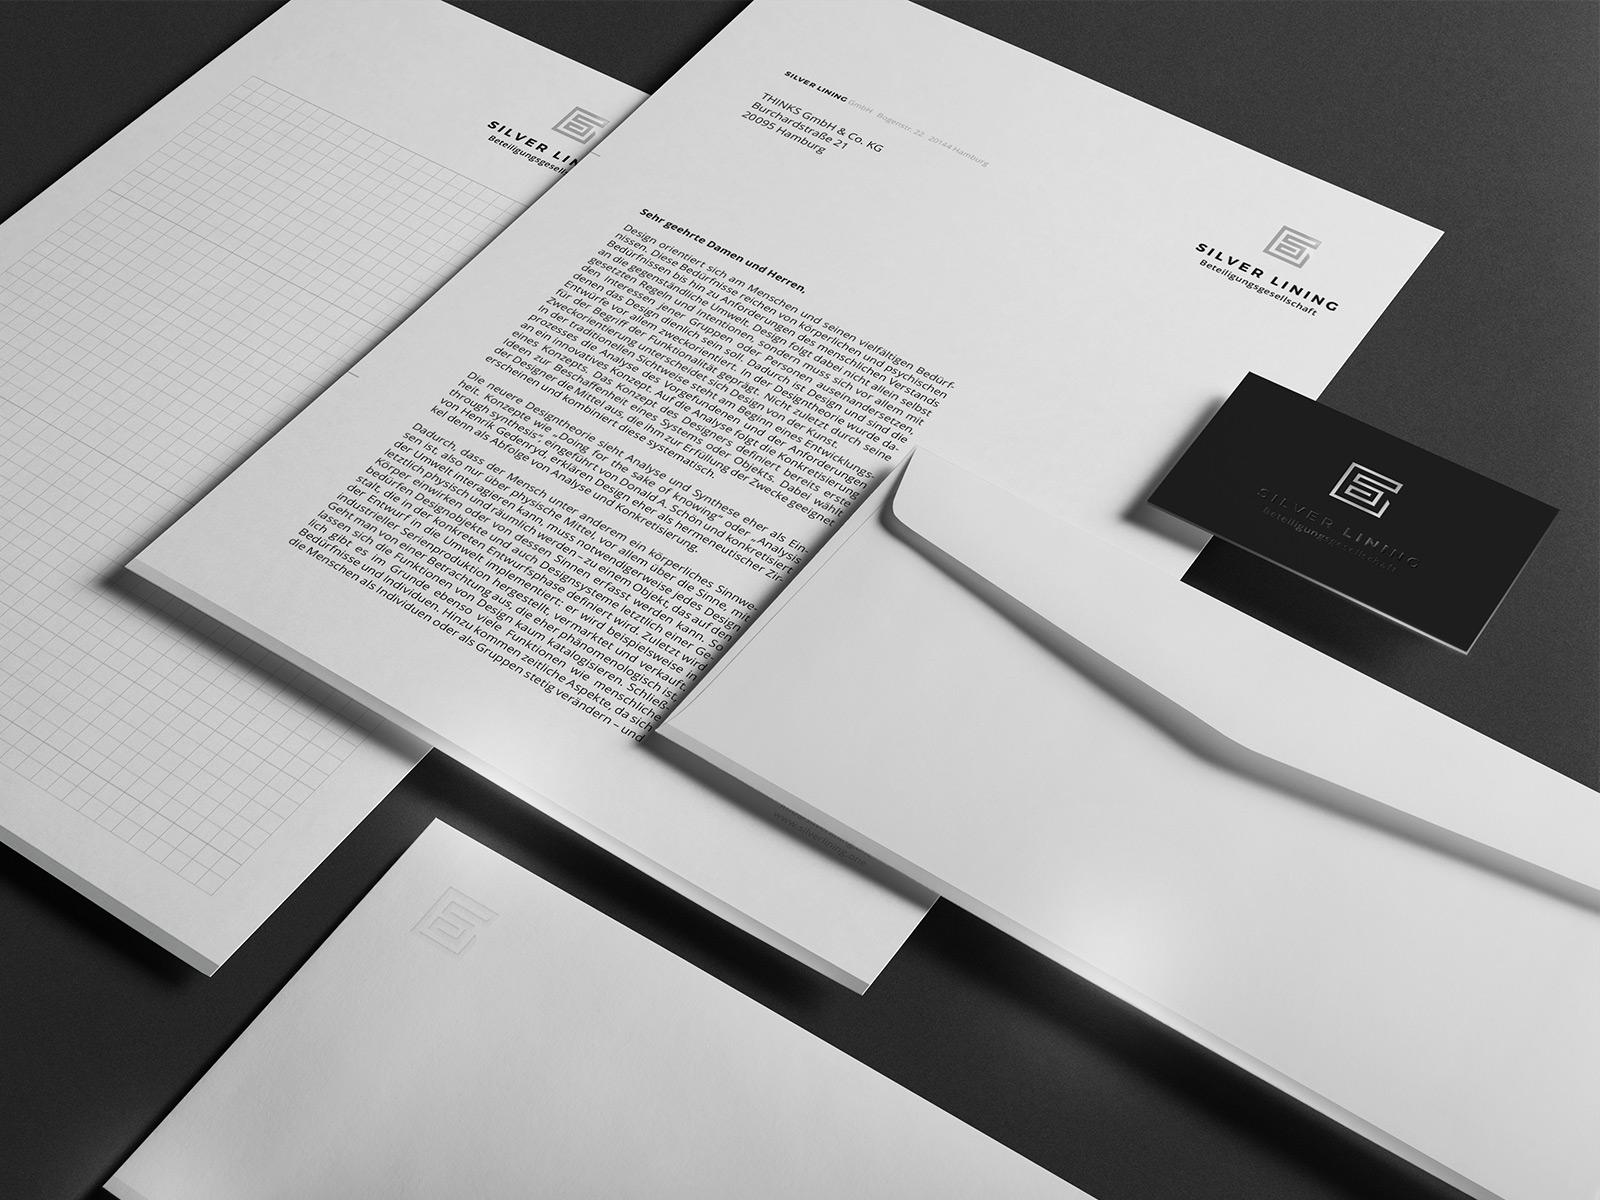 silver-design-grafik-kommunikation-gestaltung